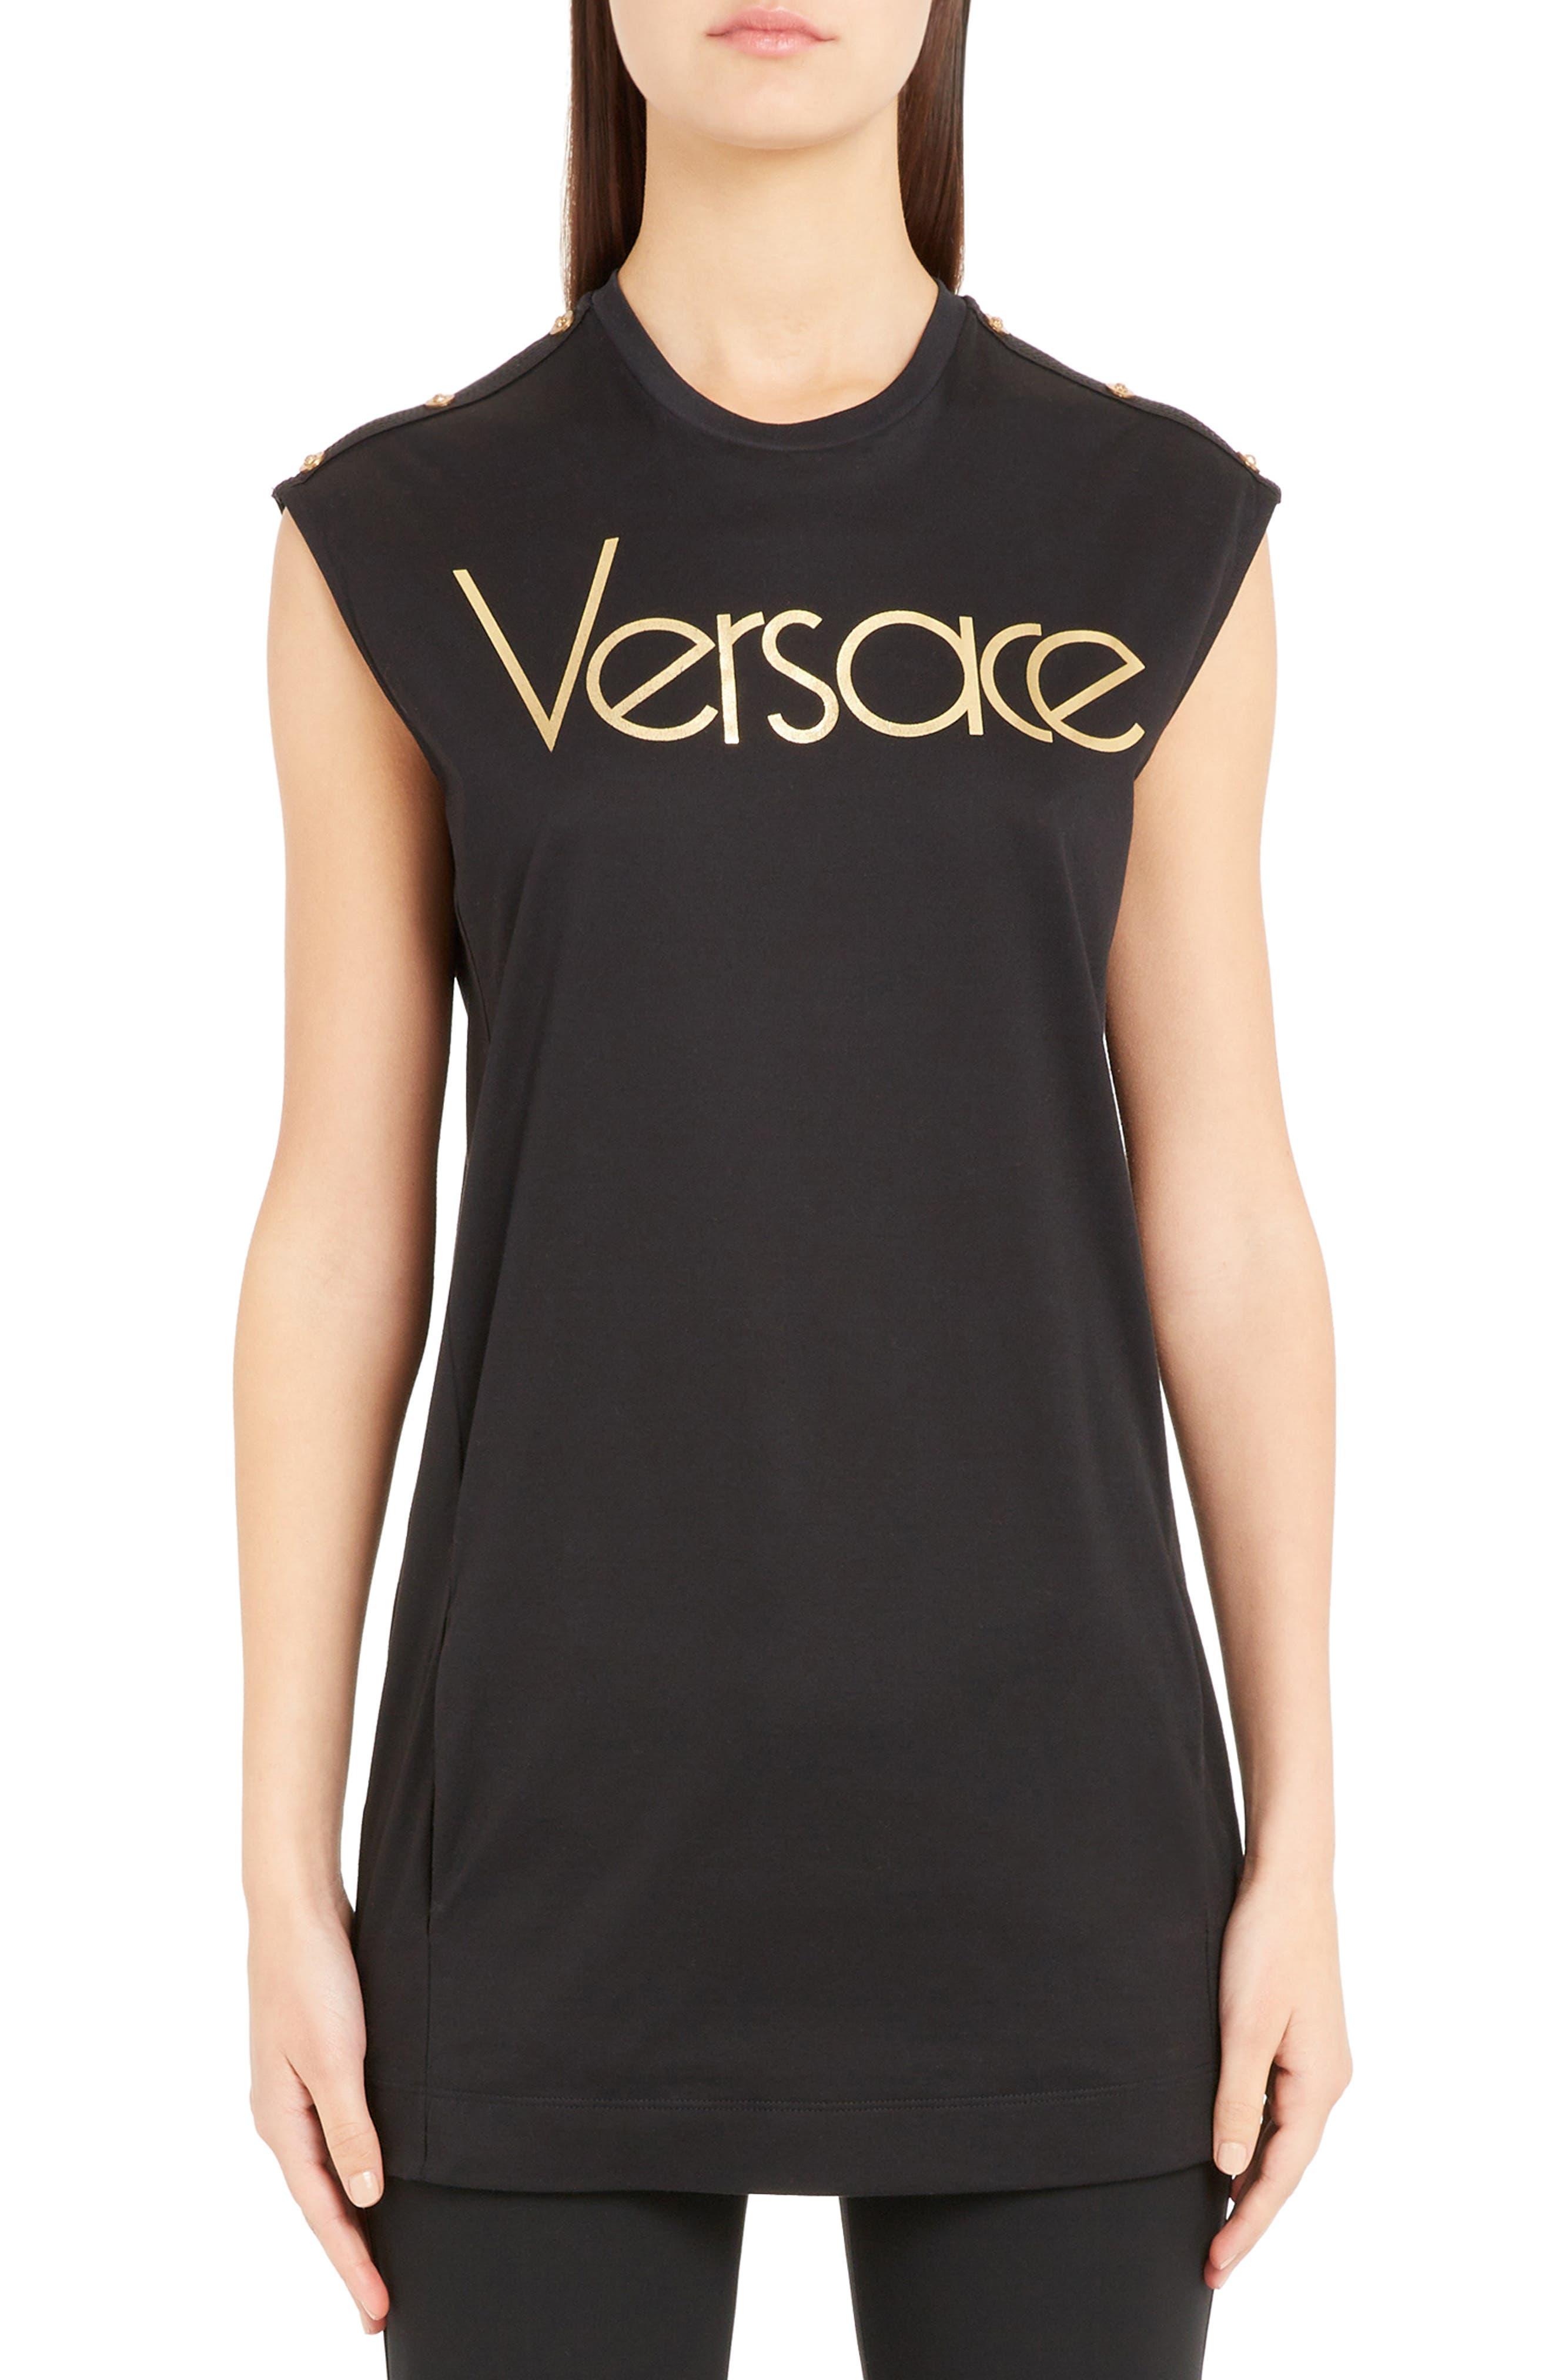 13b4c91436e51 Women s Versace Tops